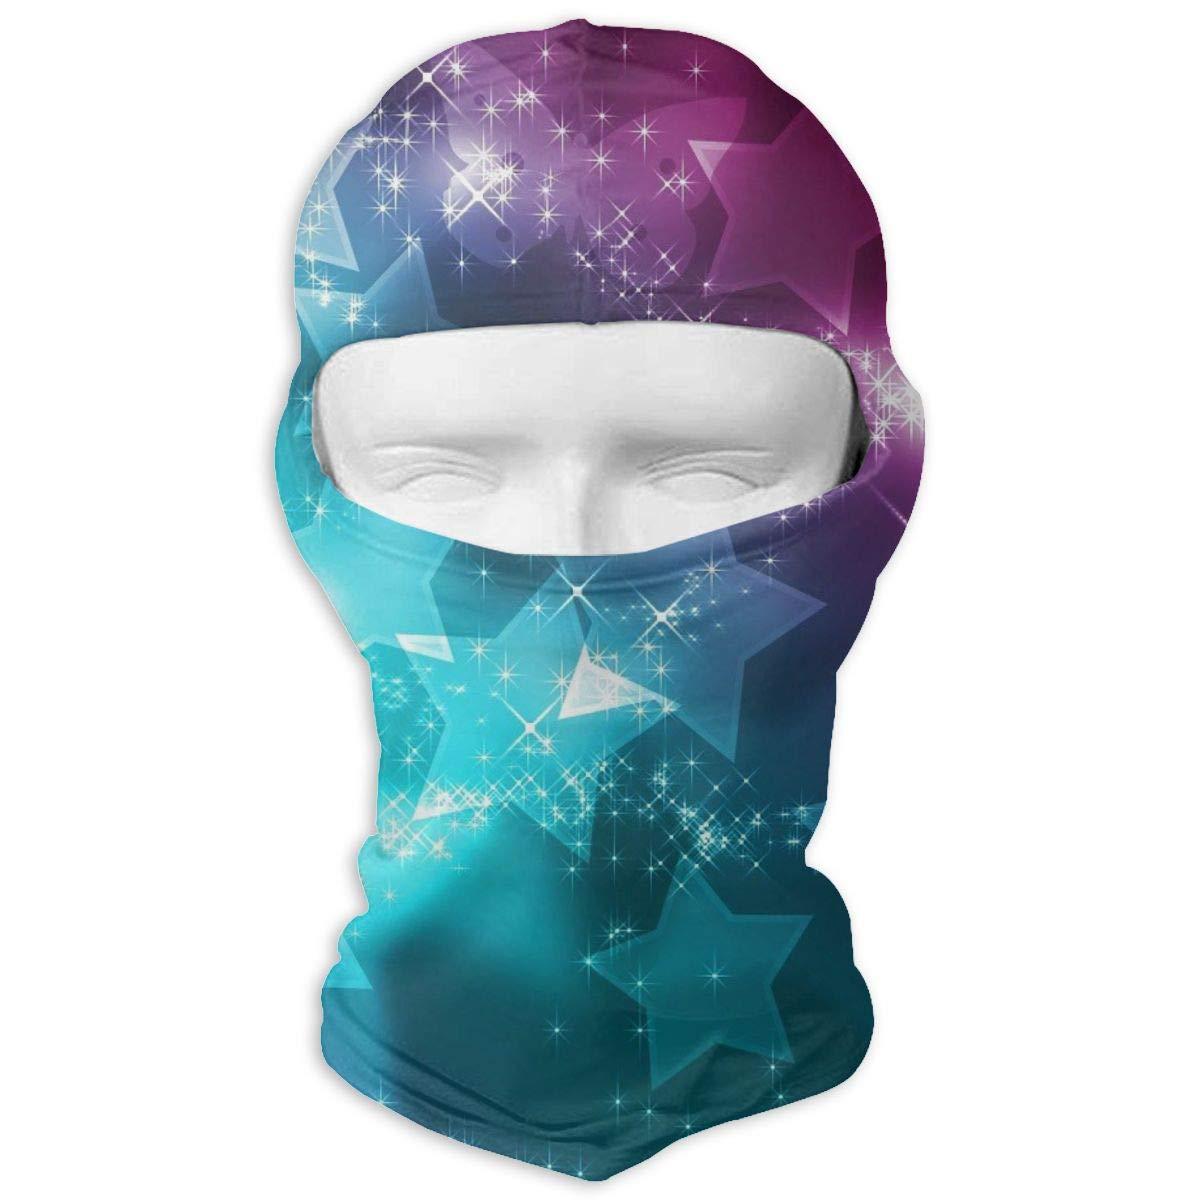 Wind-Resistant Face Mask LaoJi Colorful Stars Winter Ski Mask Balaclava Hood